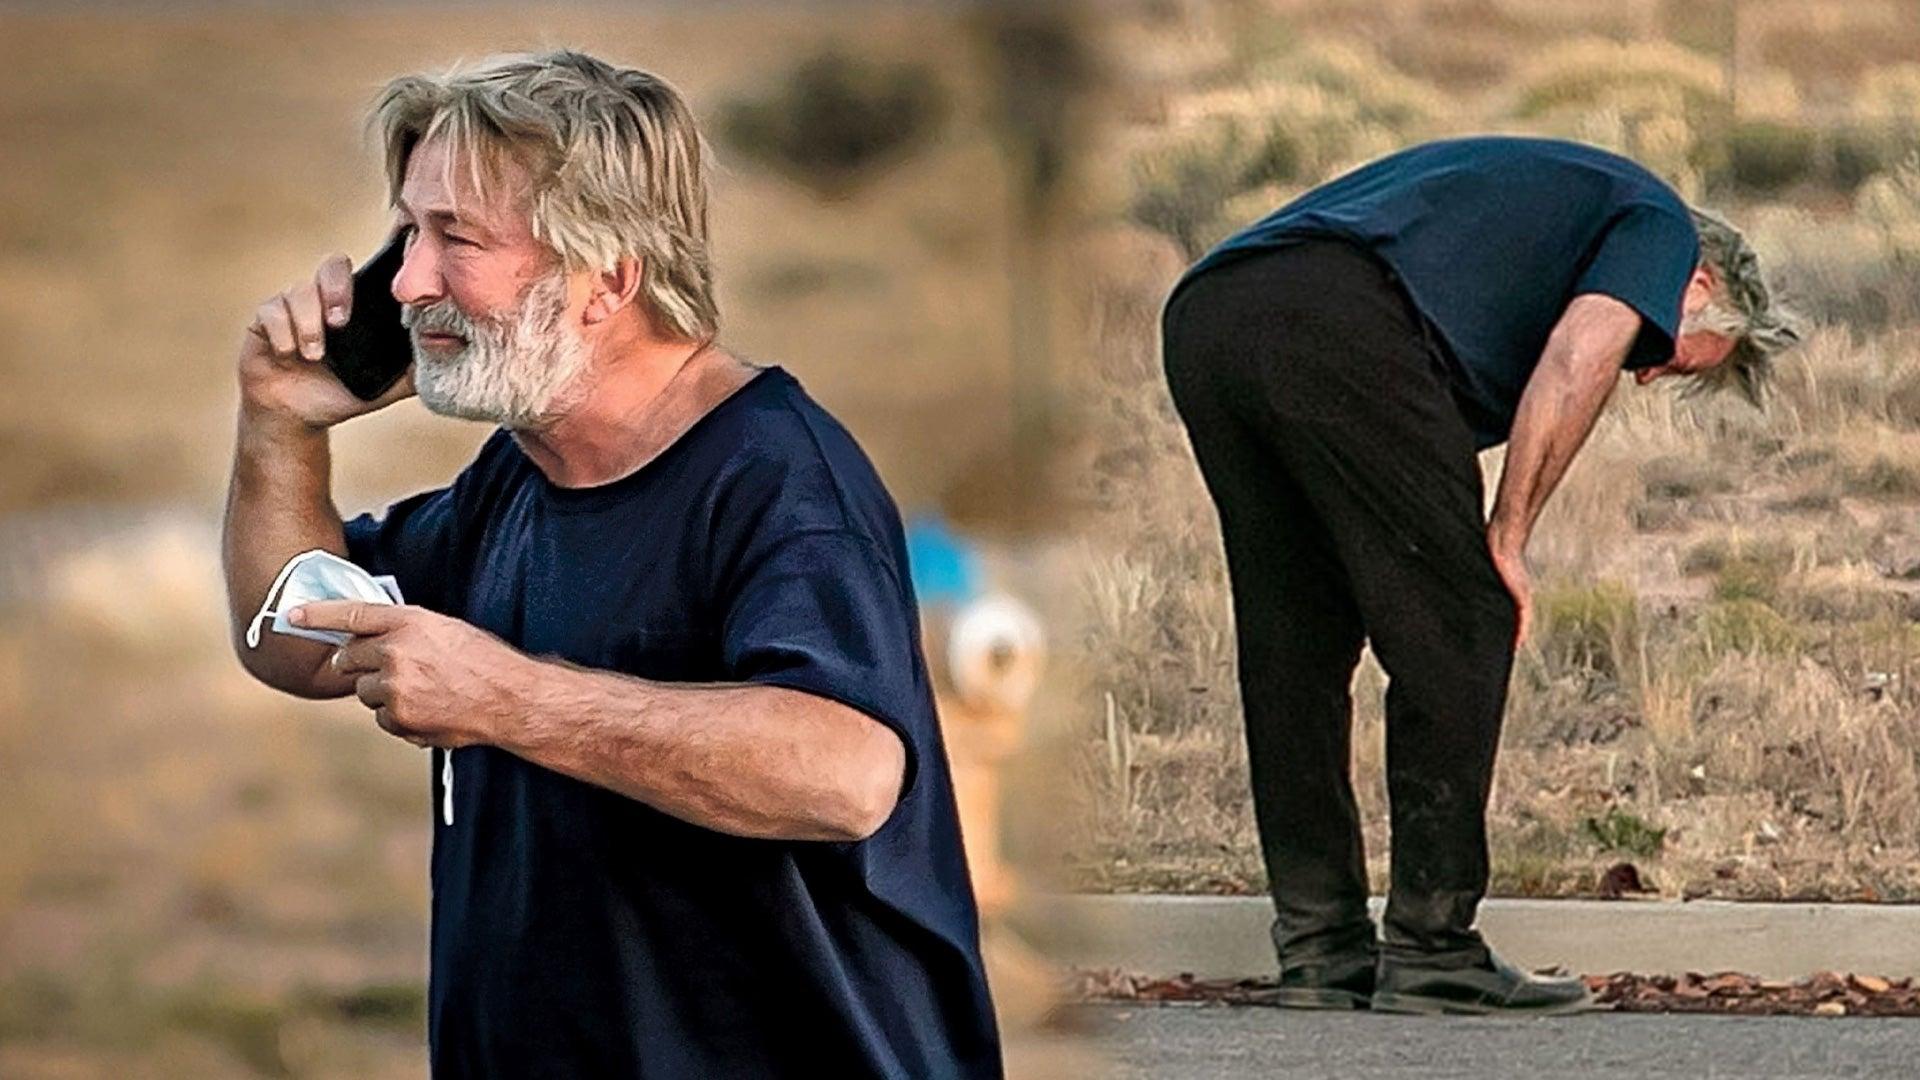 Alec Baldwin Fired Prop Gun That Killed 'Rust' Cinematographer and Injured Director